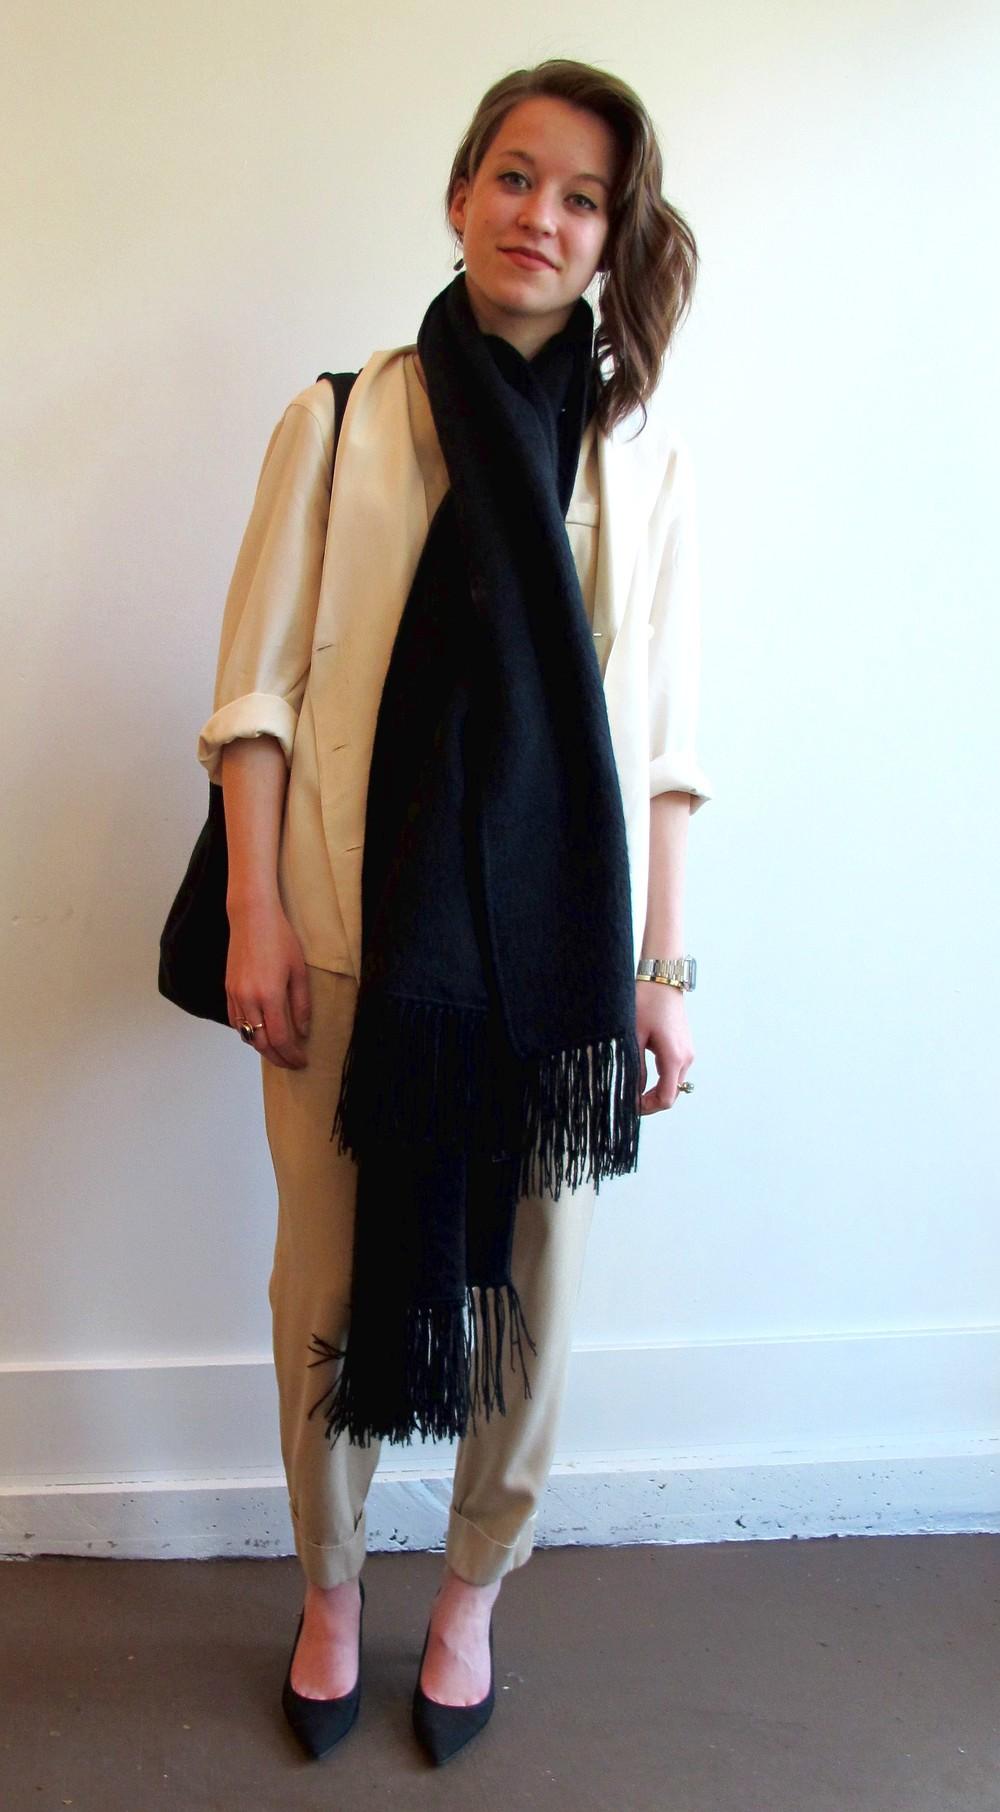 Street Style Girl.JPG